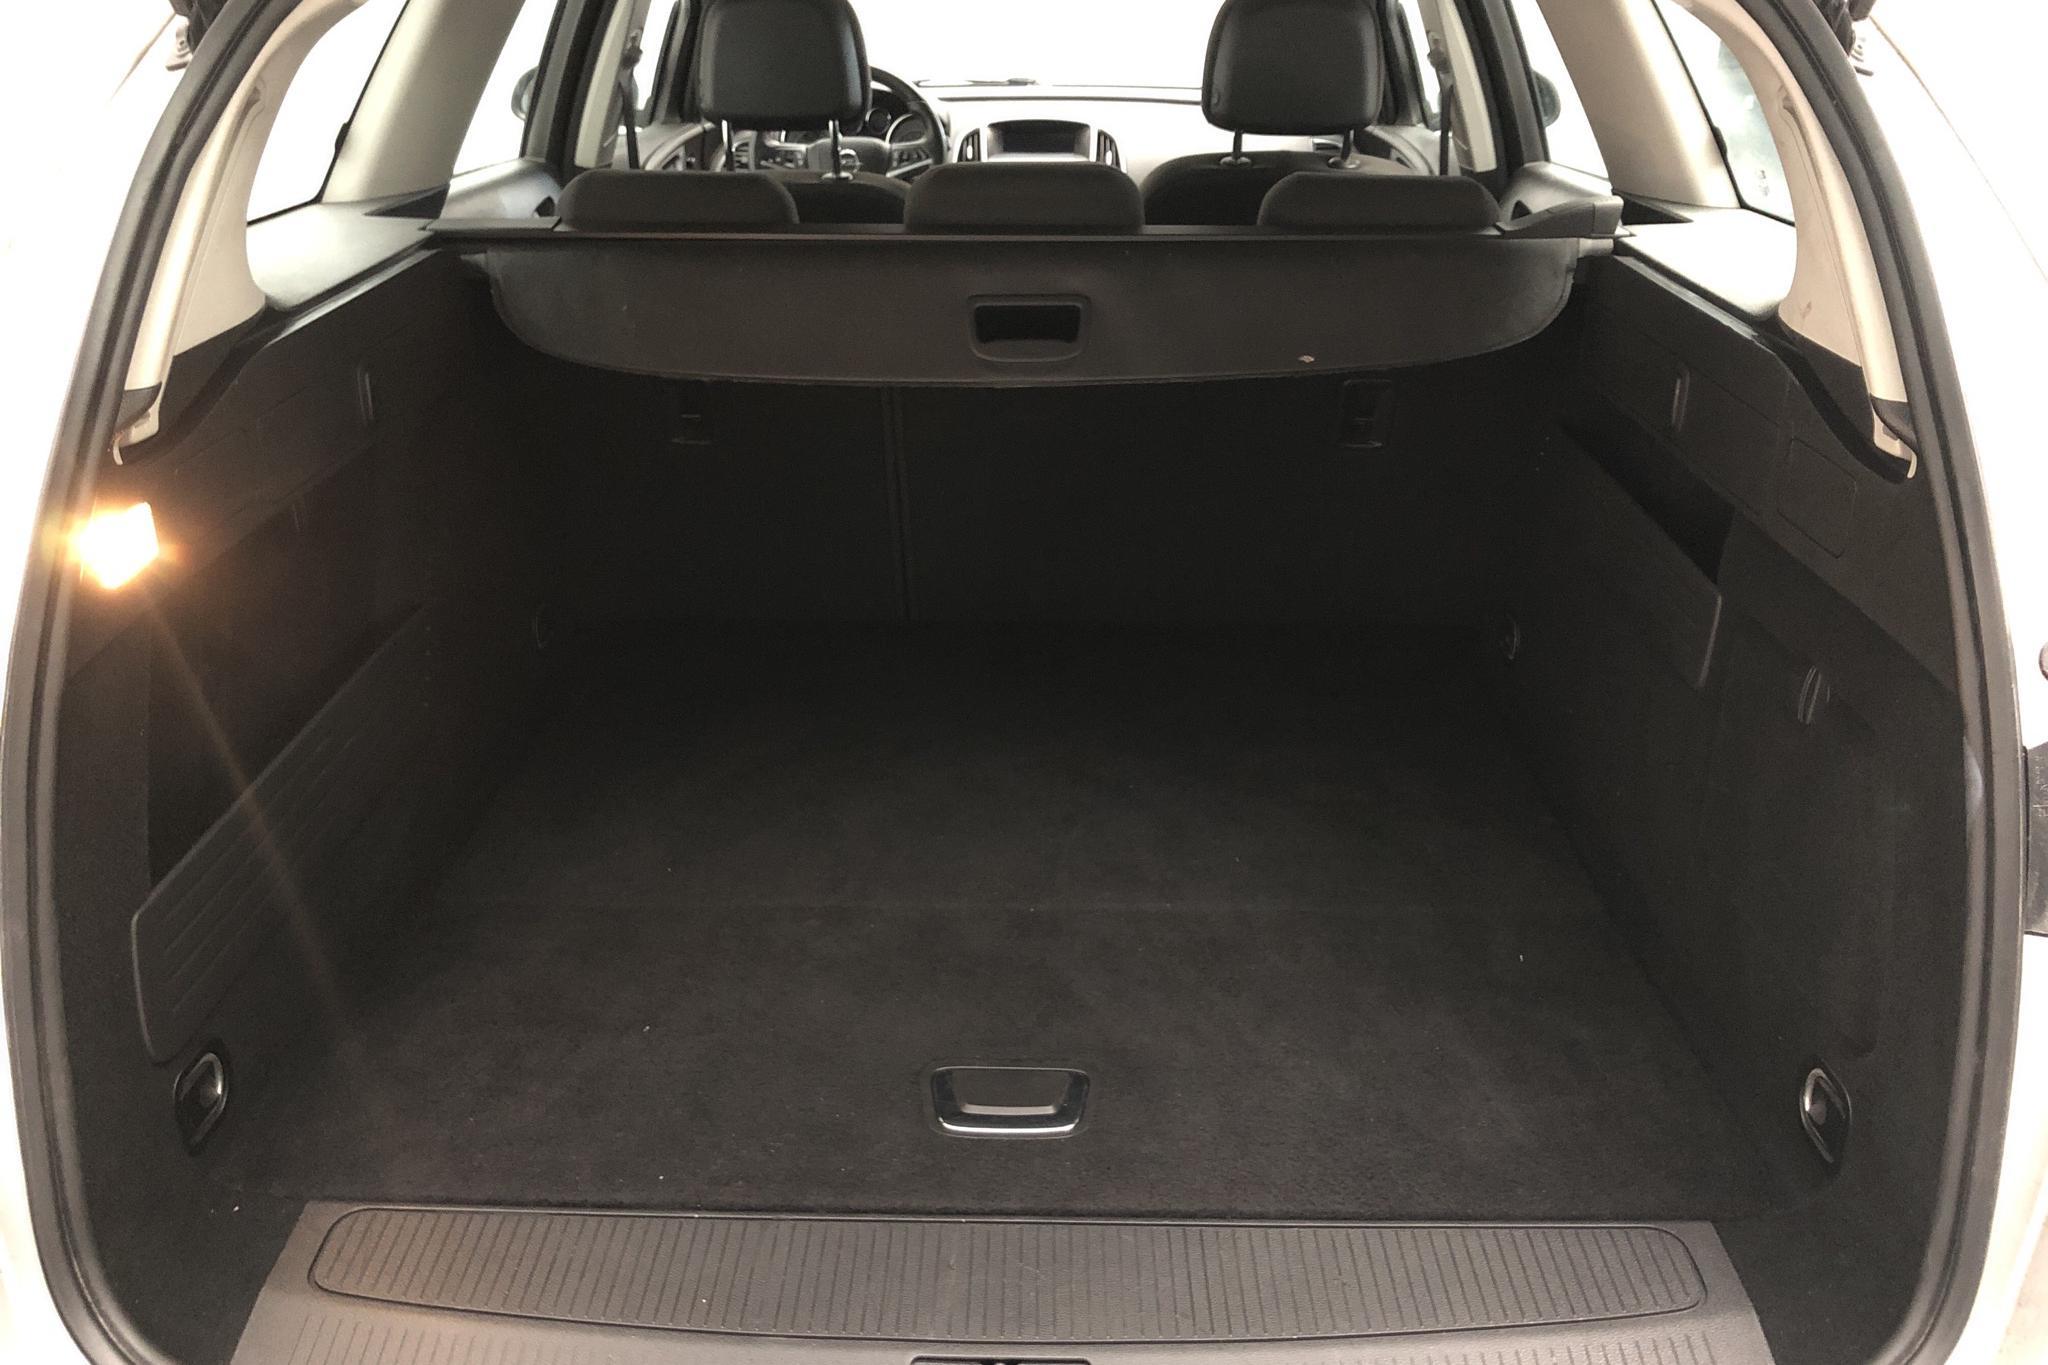 Opel Astra 1.7 CDTI ecoFLEX Sports Tourer (110hk) - 13 514 mil - Manuell - grå - 2013